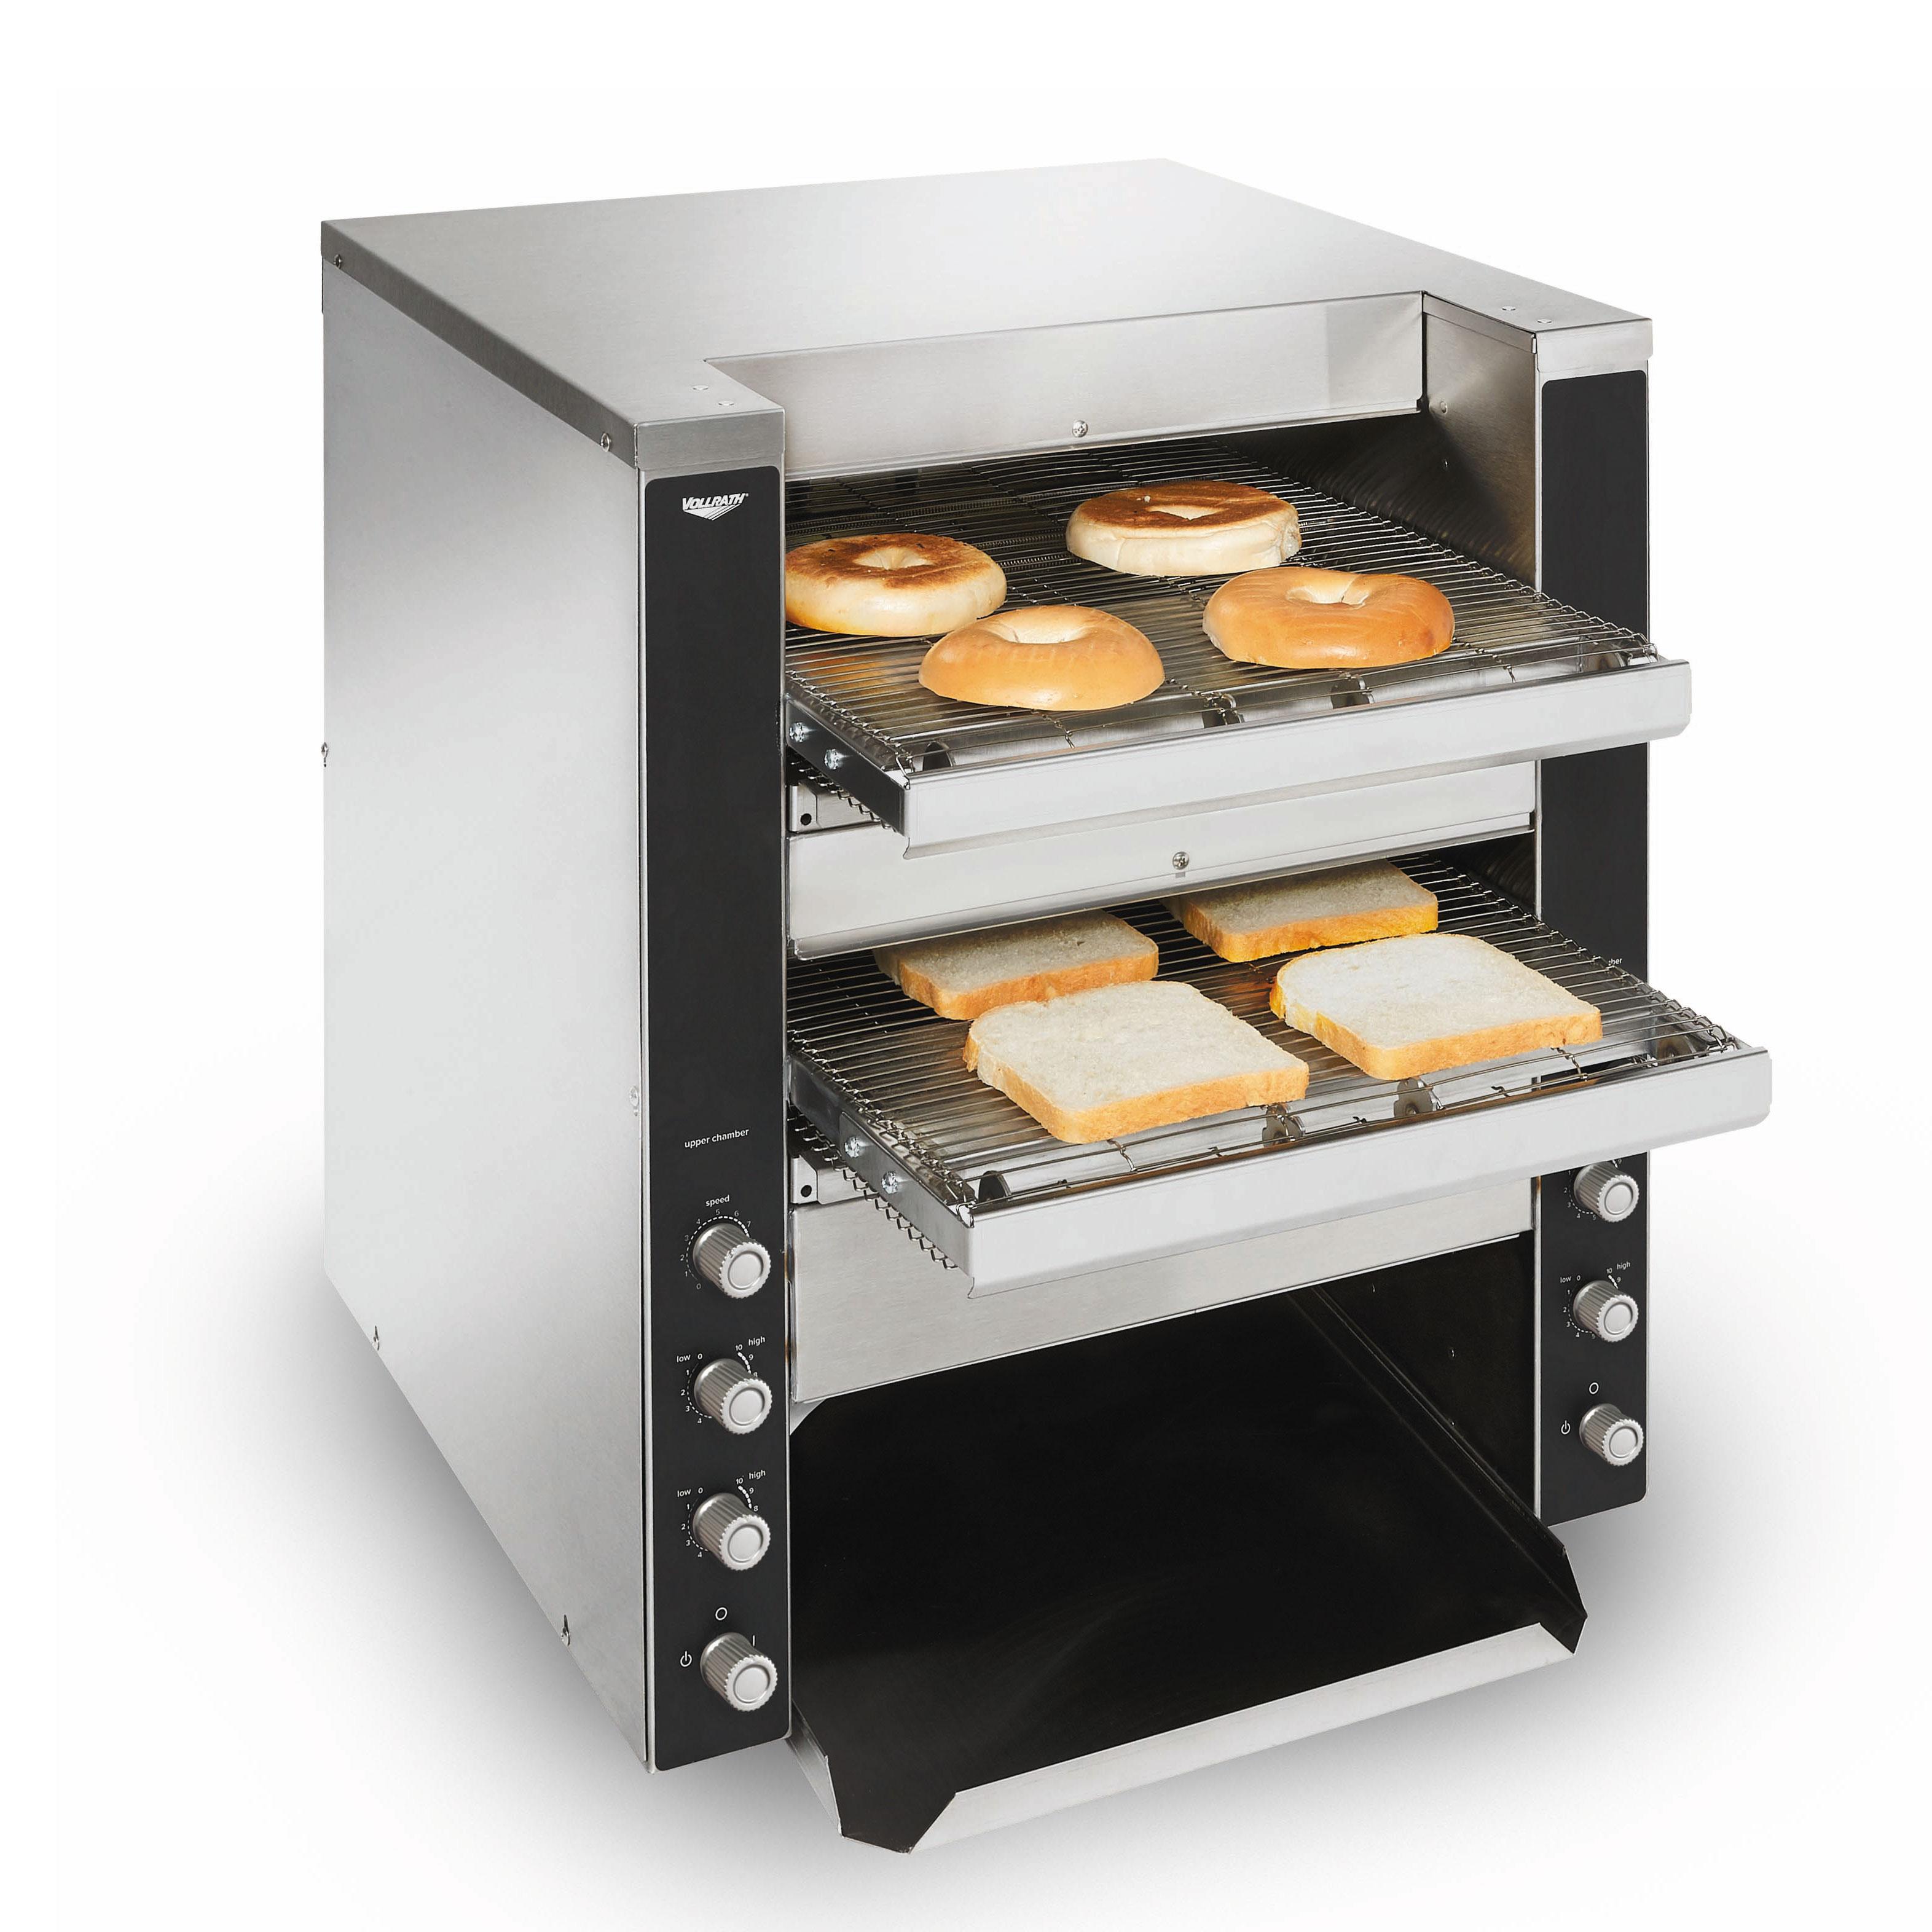 Vollrath CT4-240DUAL toaster, conveyor type